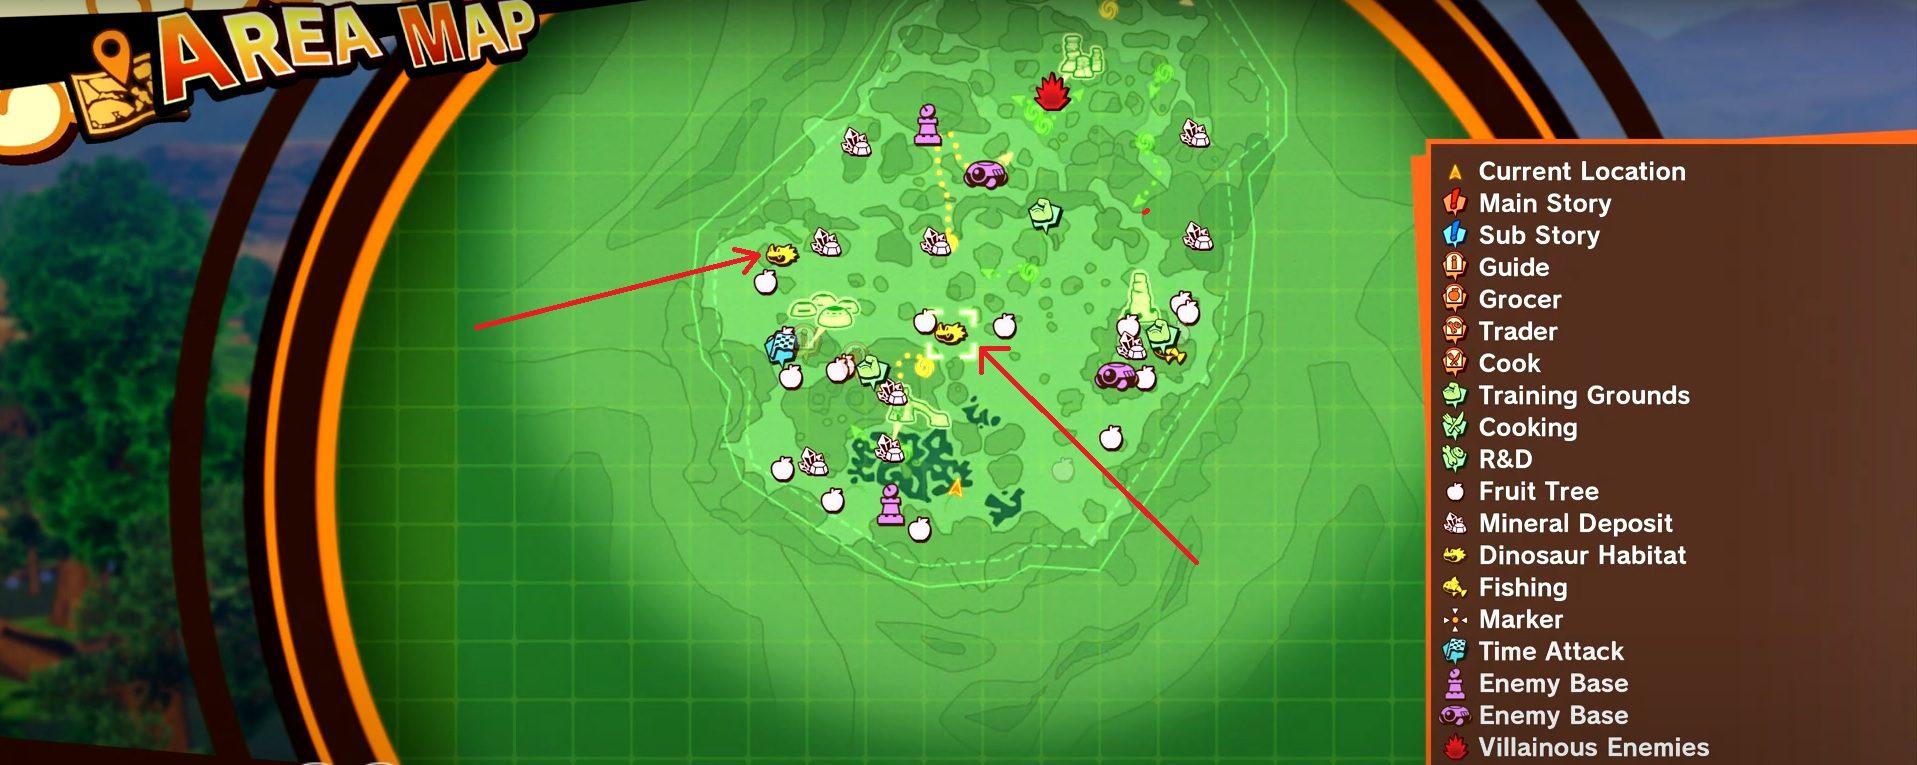 Dragon Ball Z Kakarot Prime Marbled Dino Meat Location 1